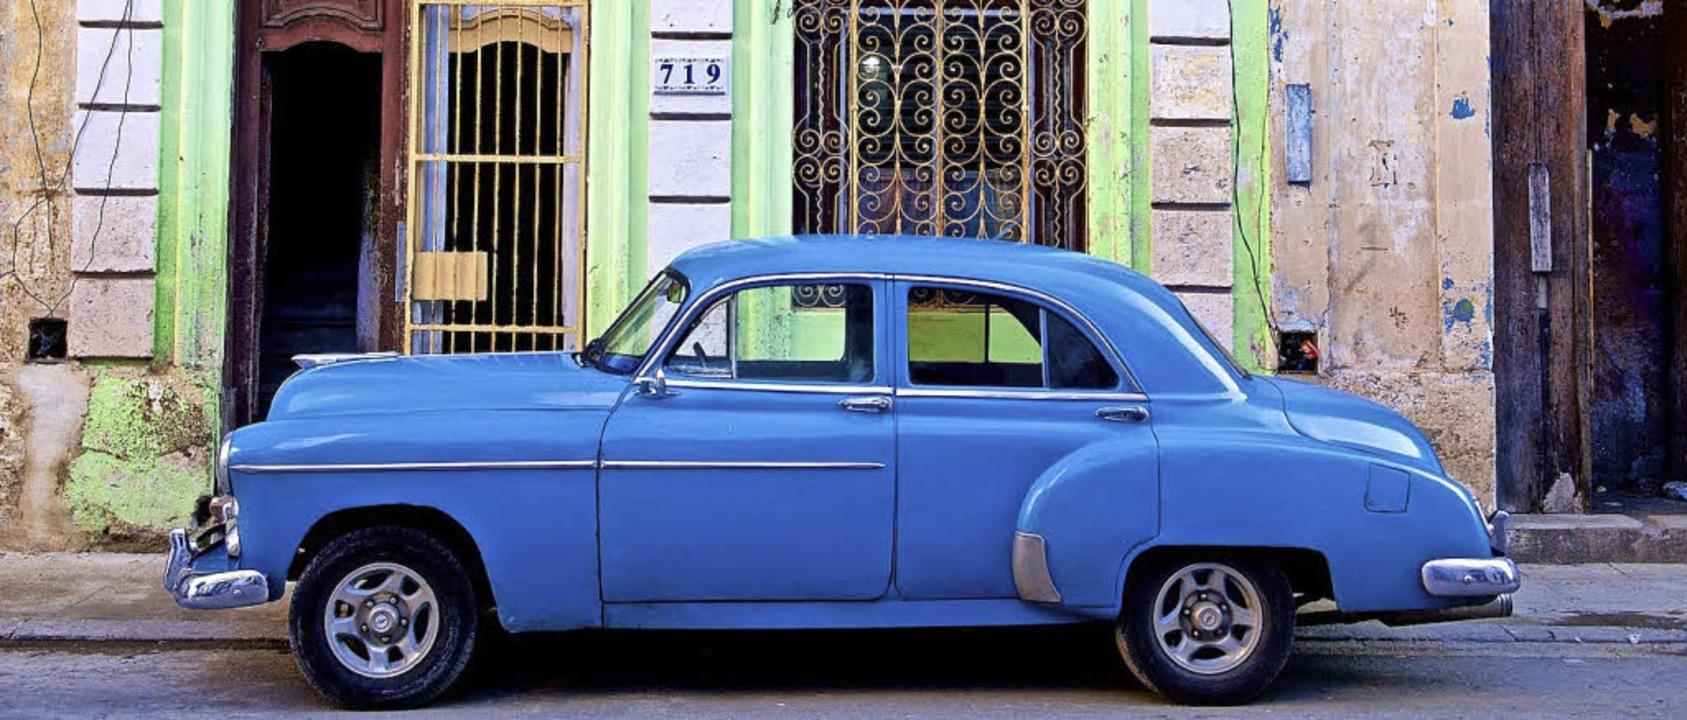 Sinnbildlich für Kuba: farbenfrohe Oldtimer     Foto: Spag Photography